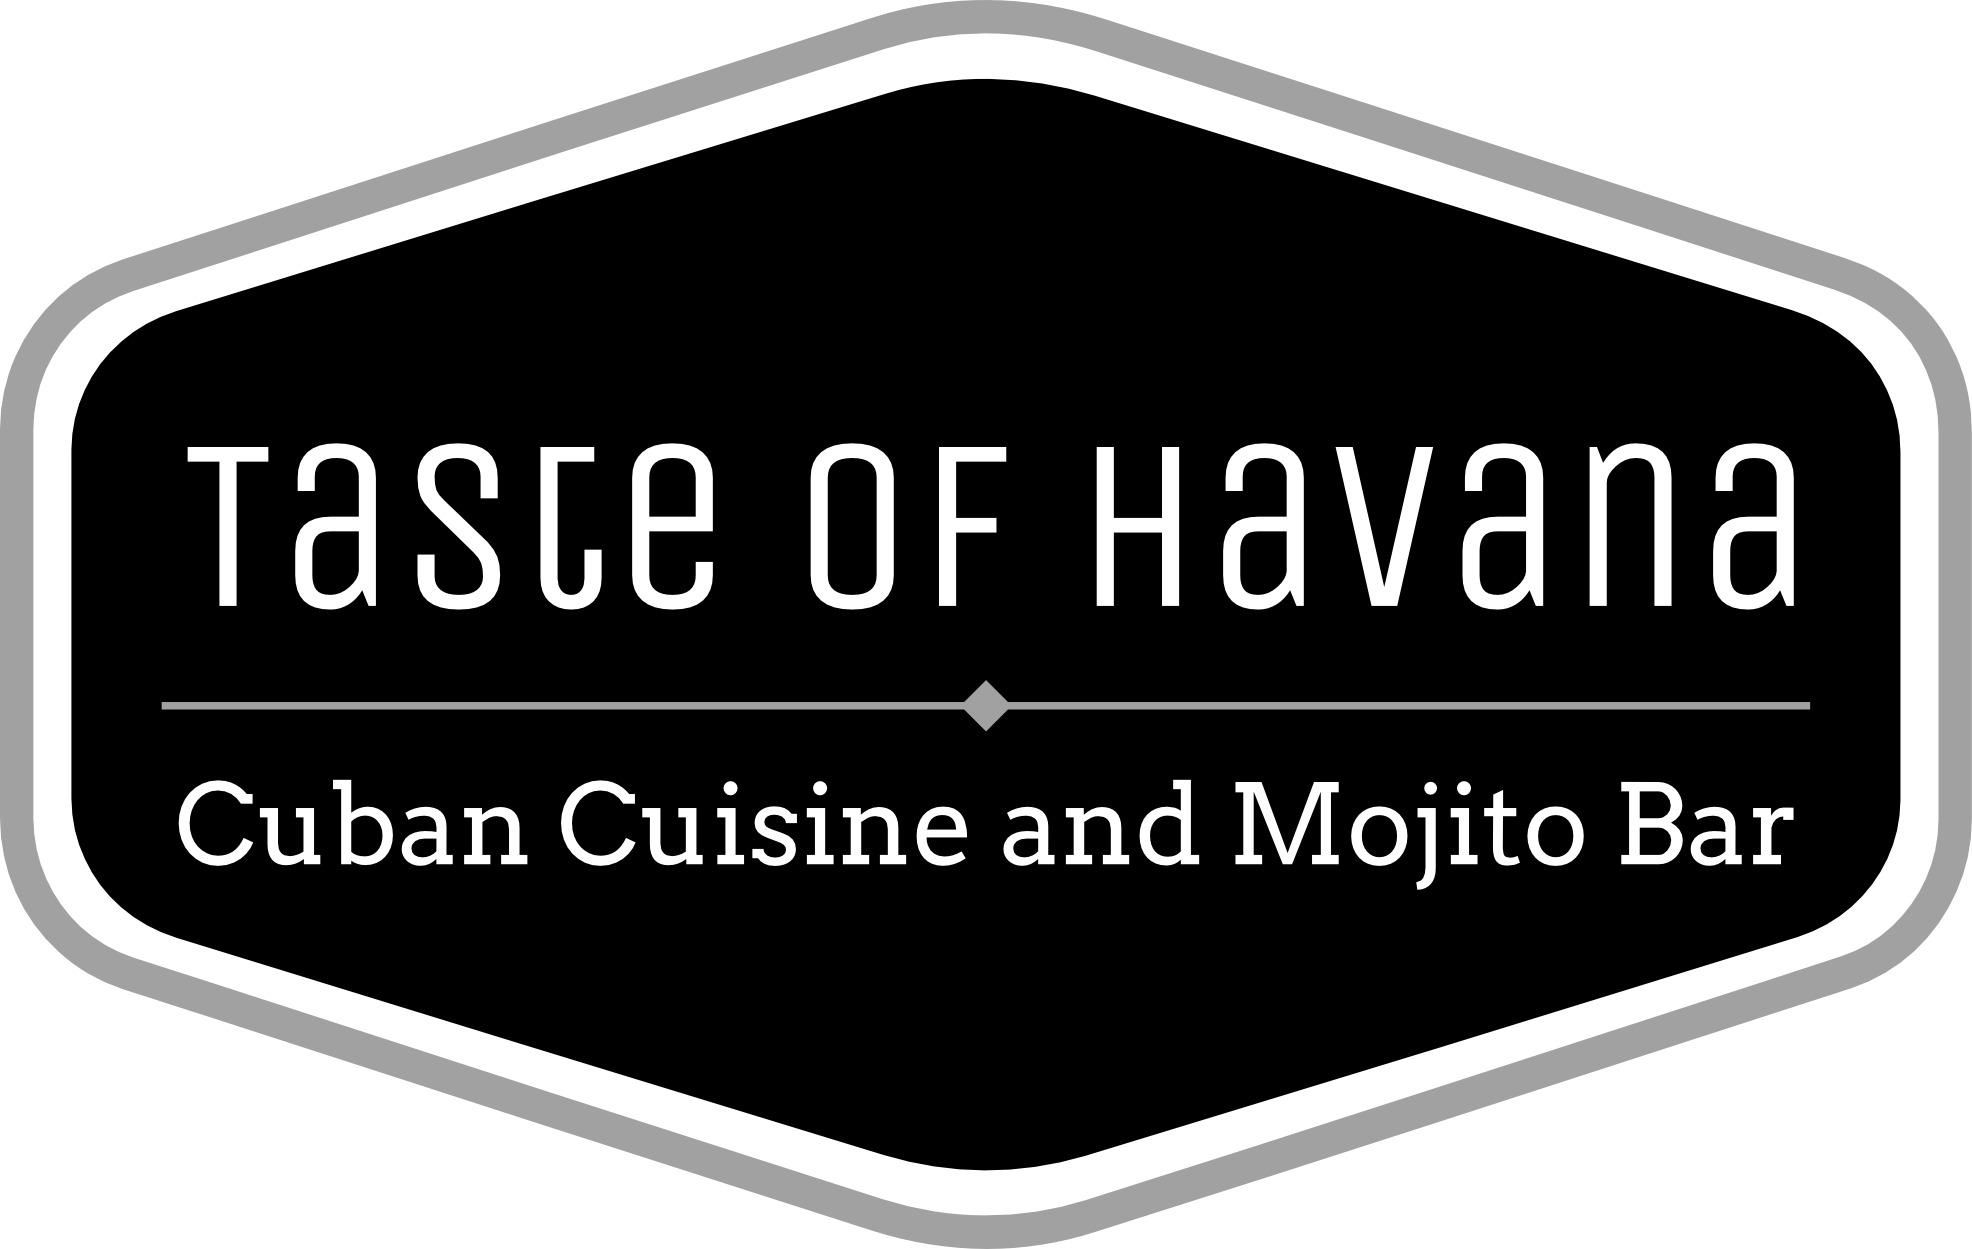 Taste of Havana 400dpiLogoCropped